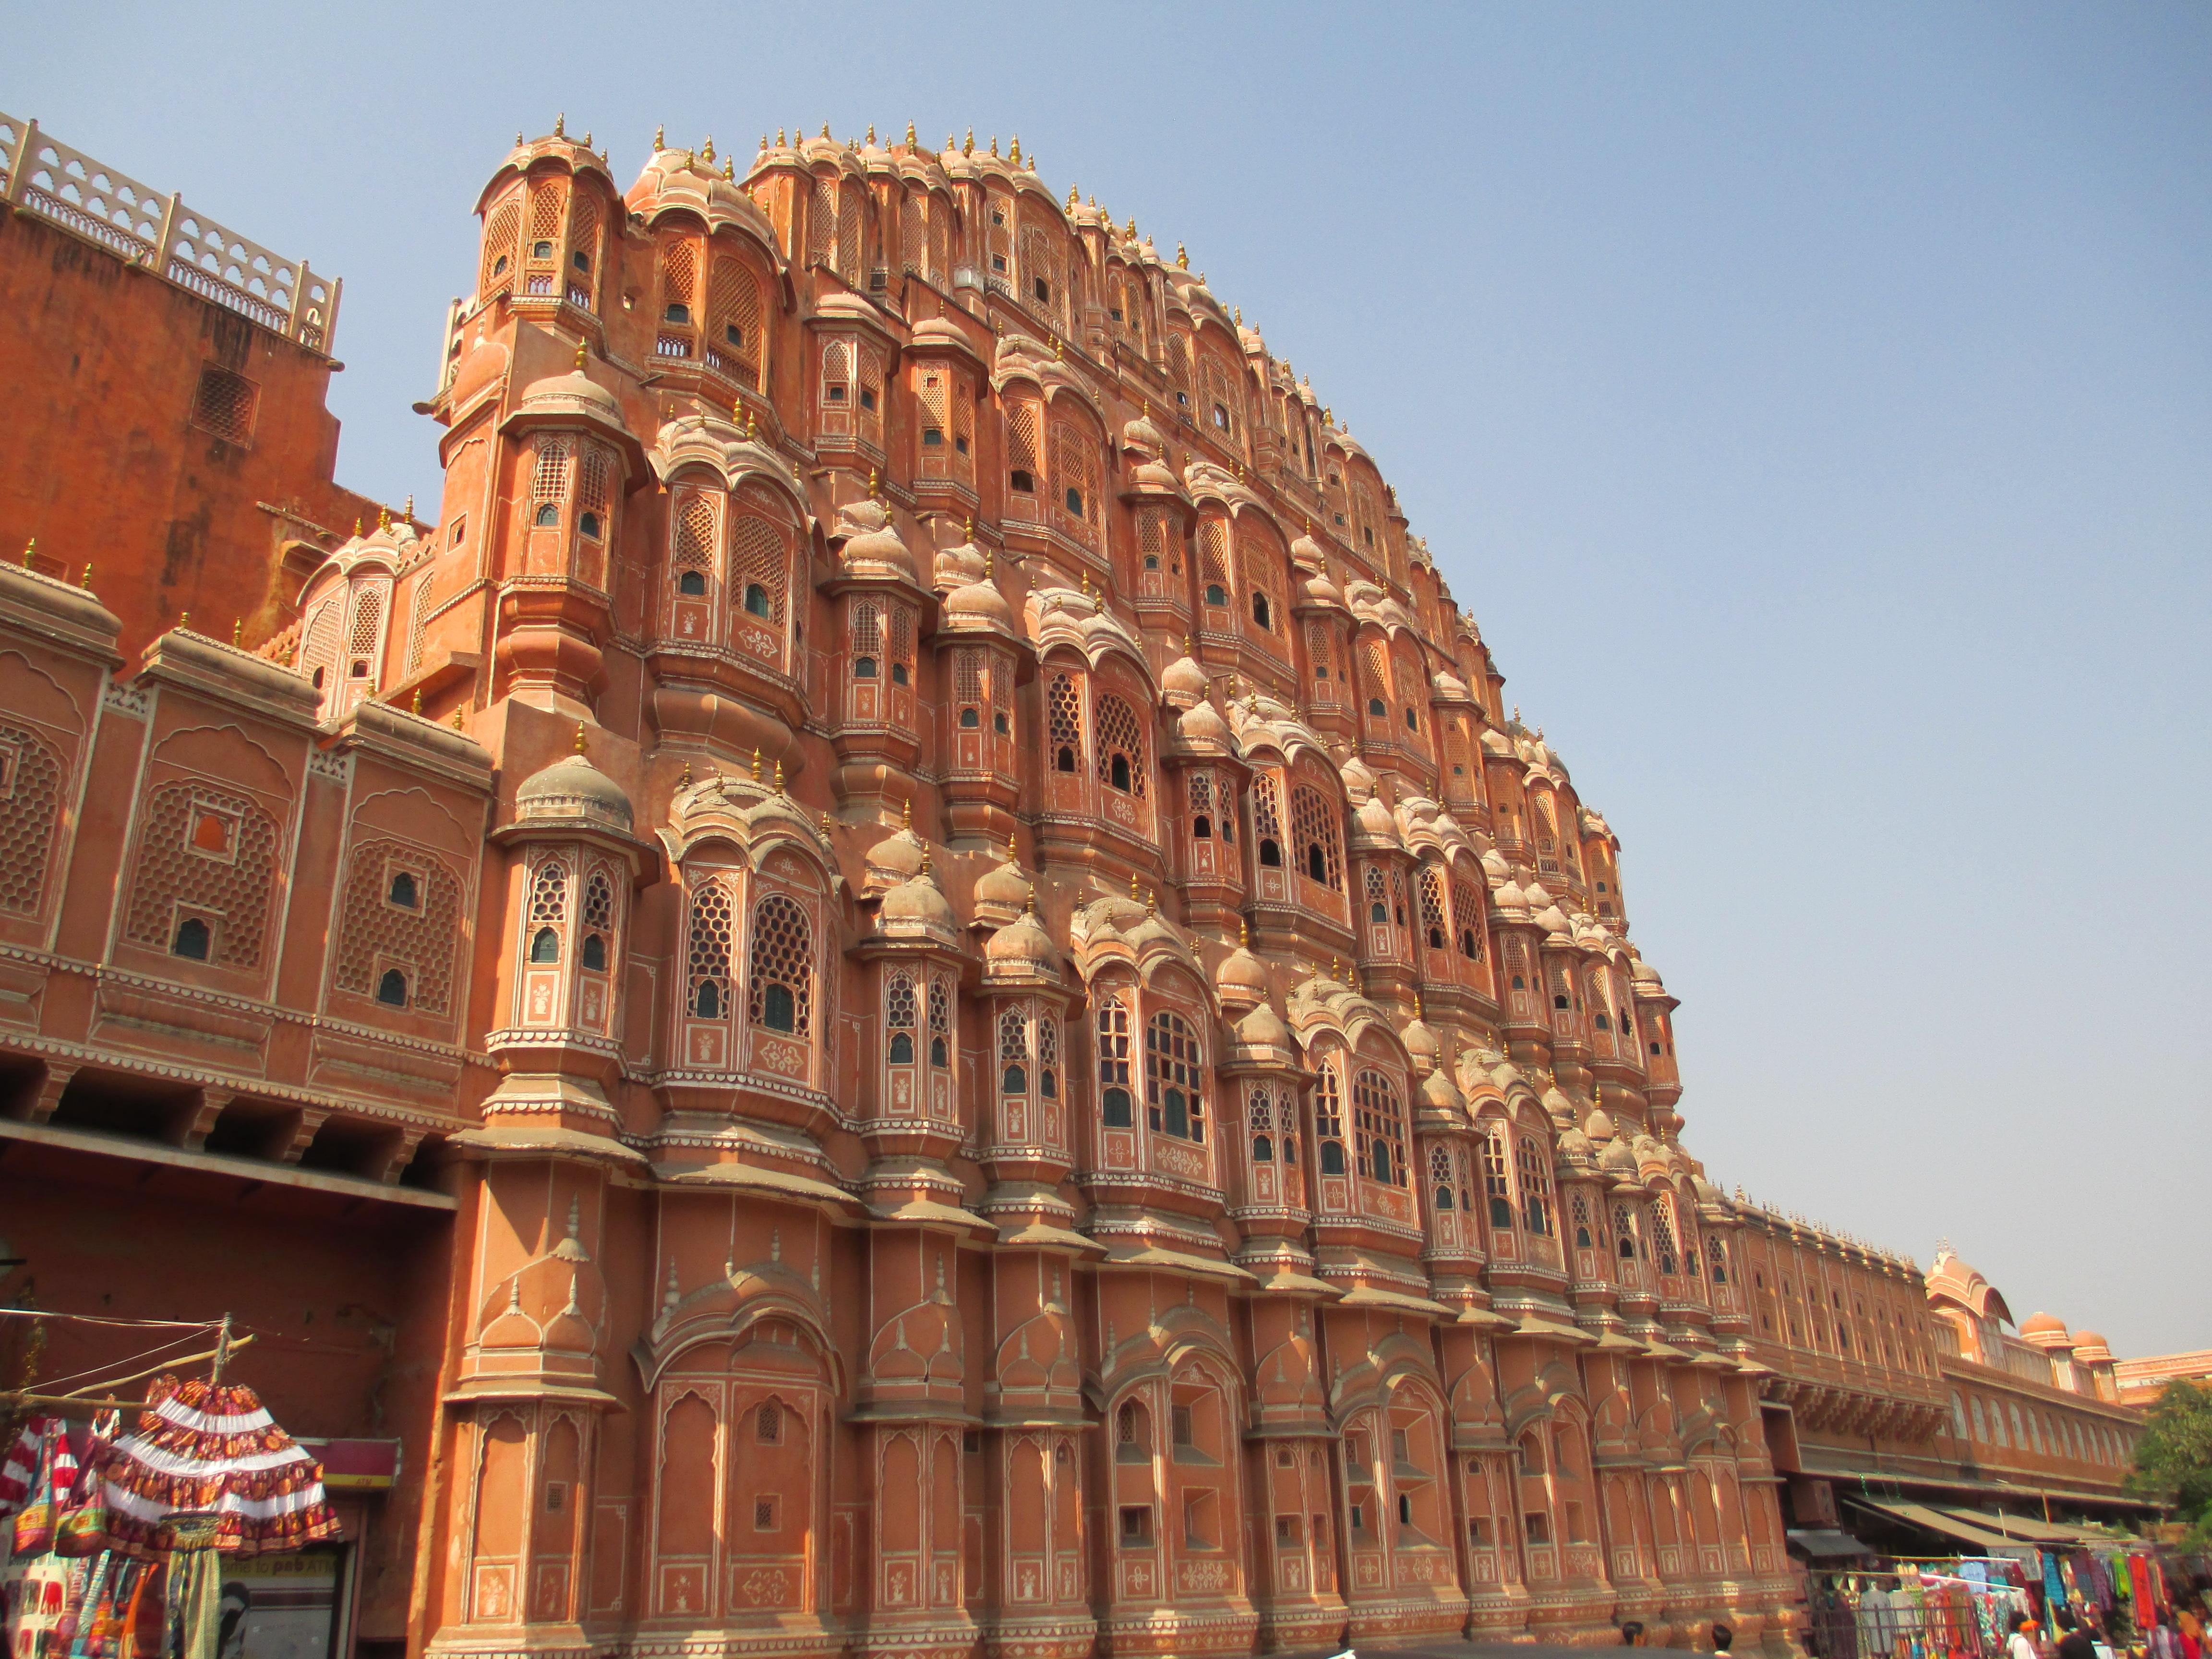 Jaipur India  city photo : Description Hawa Mahal, Jaipur India